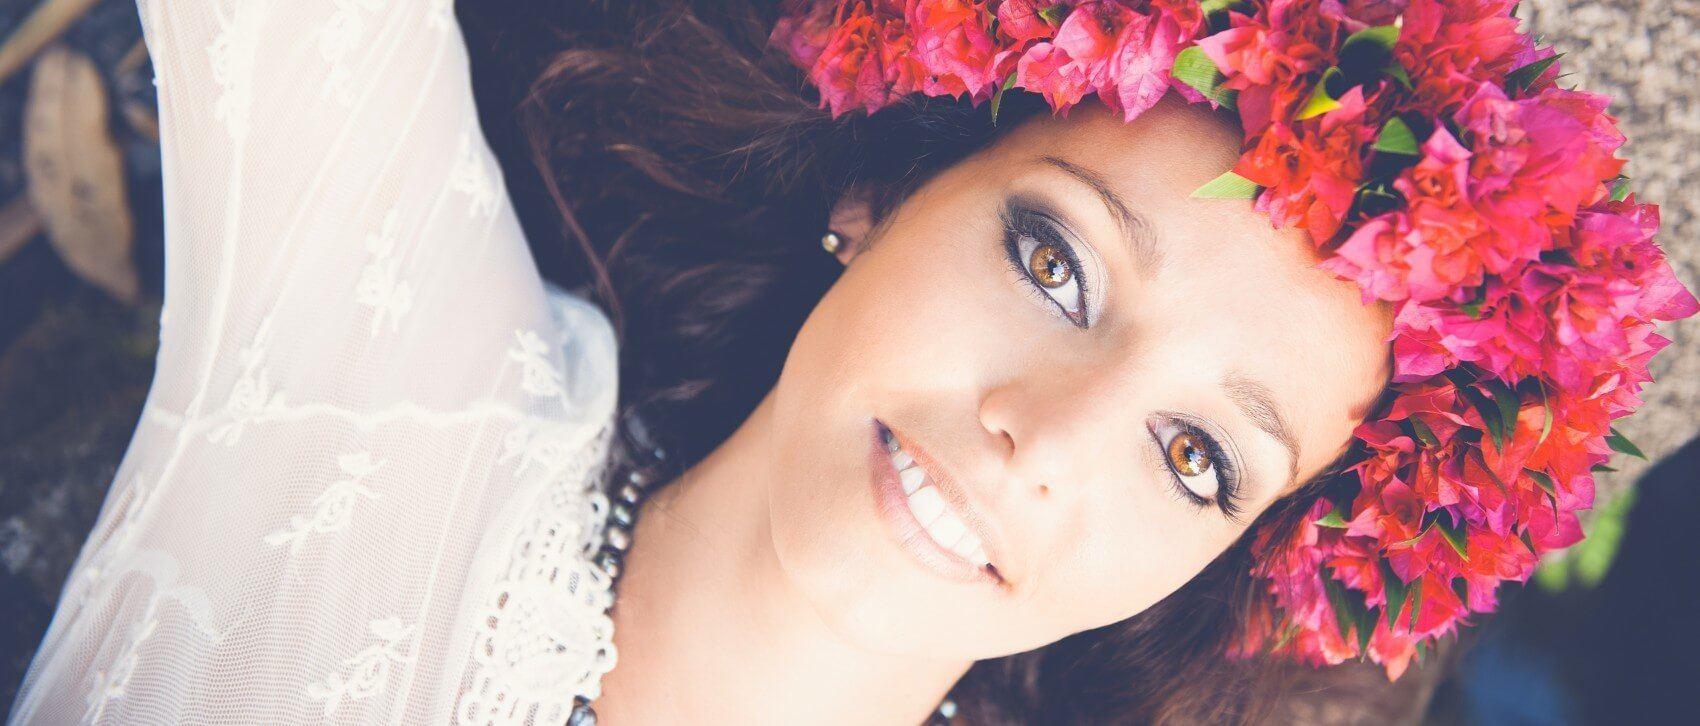 marc-gerard-photographe-mariage-montpellier-mode-tahiti-5